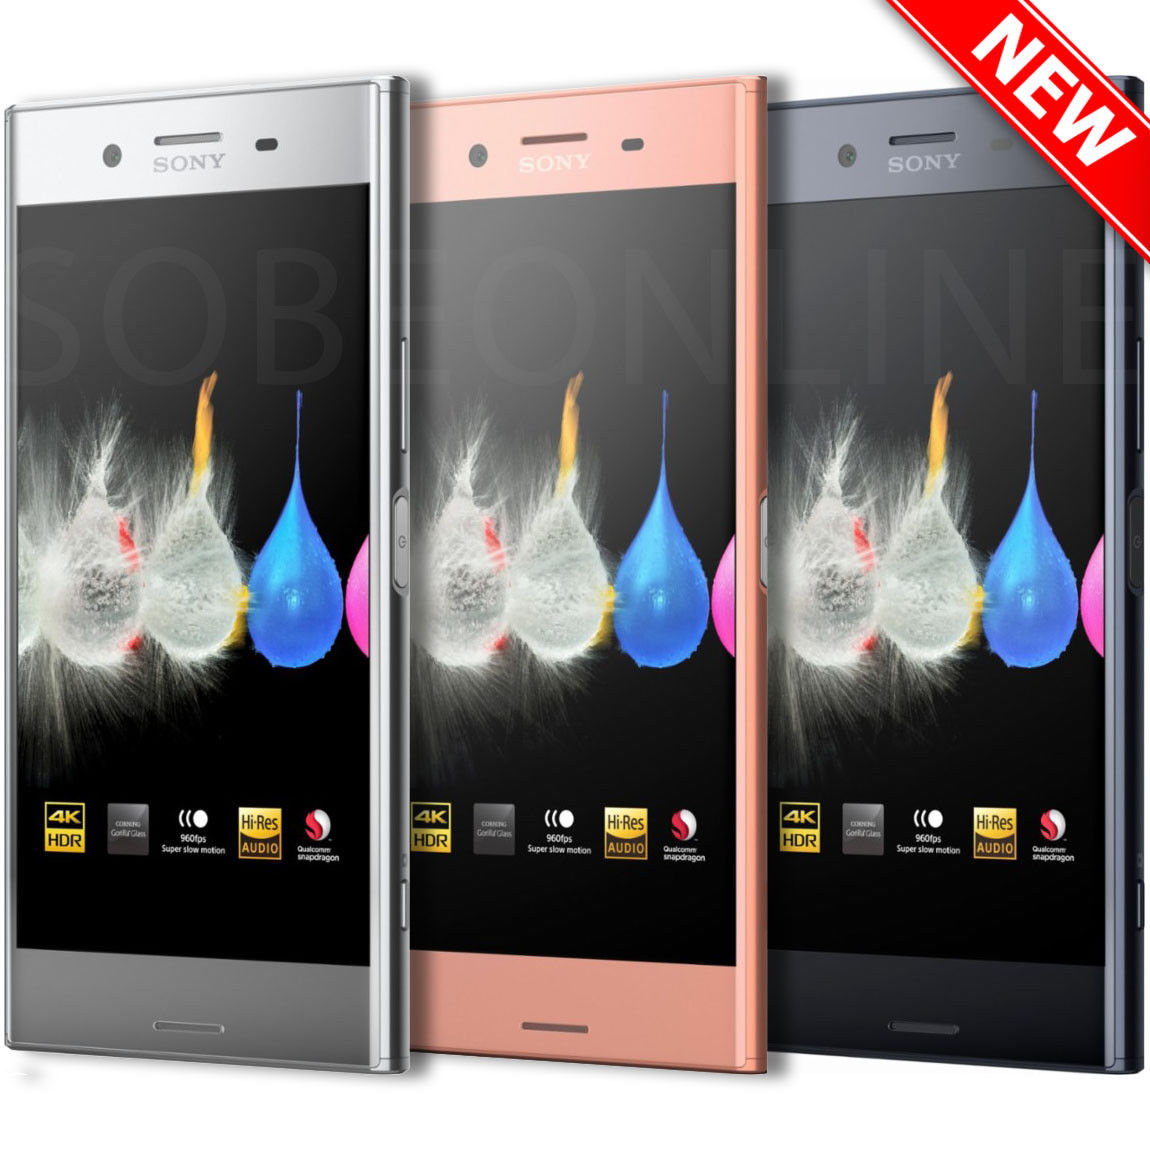 e0712e541cd Details about Sony XPERIA XZ Premium Dual G8142 (FACTORY UNLOCKED) 5.5